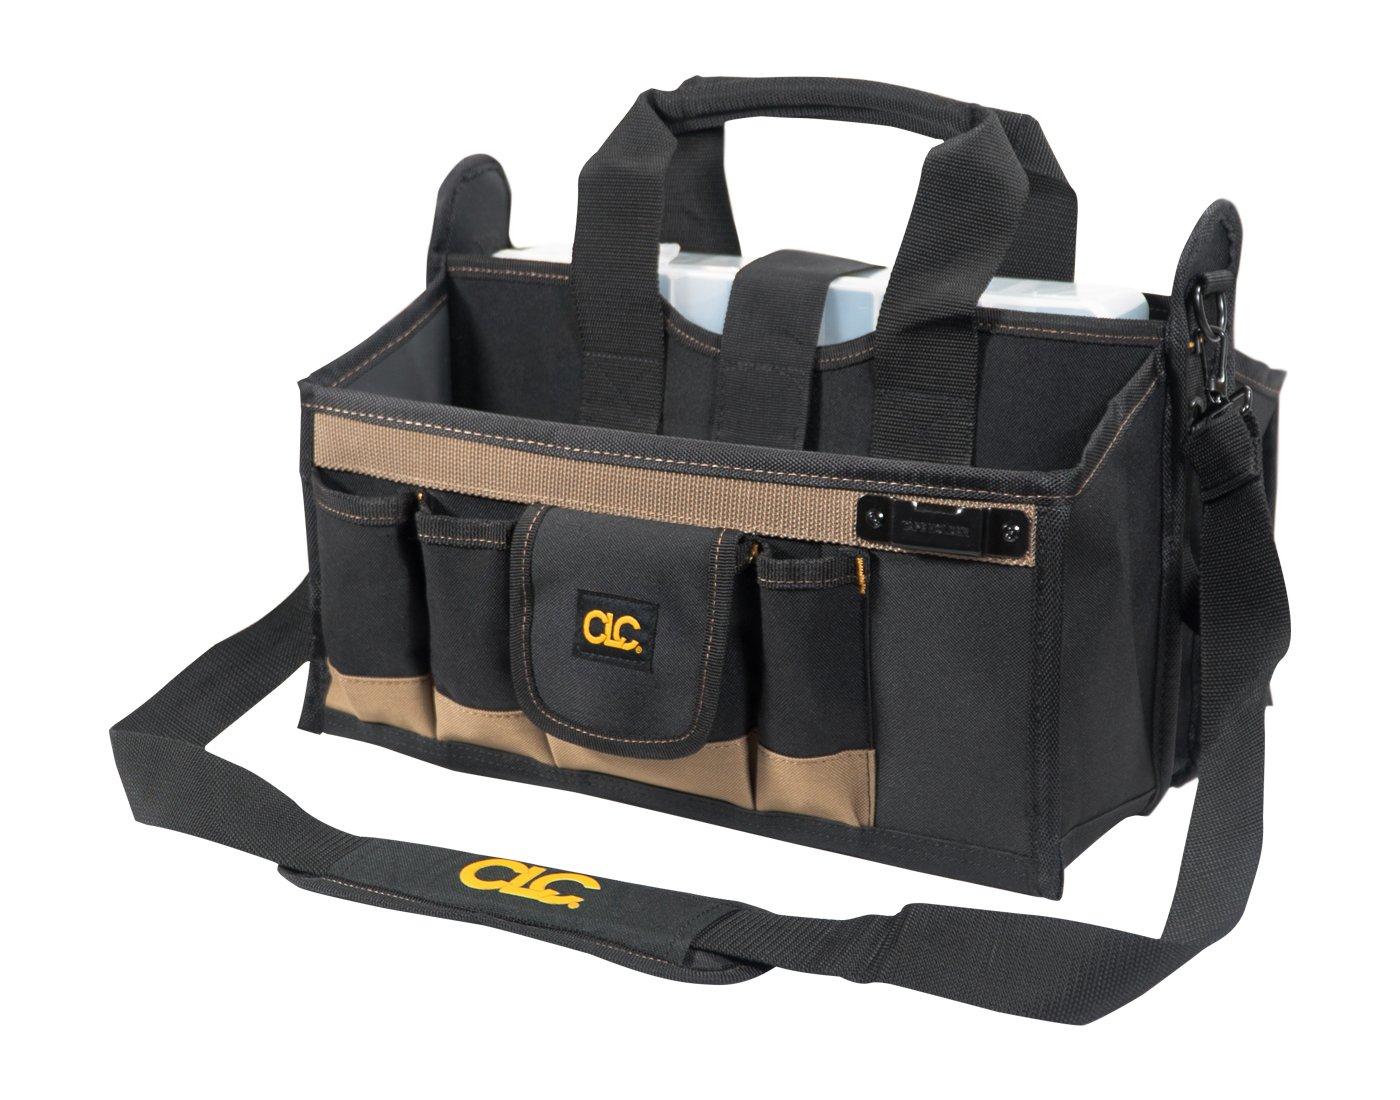 Custom Leathercraft Custom LeatherCraft 1529 16-Pocket, 16-Inch Center Tray Tool Bag by Custom Leathercraft